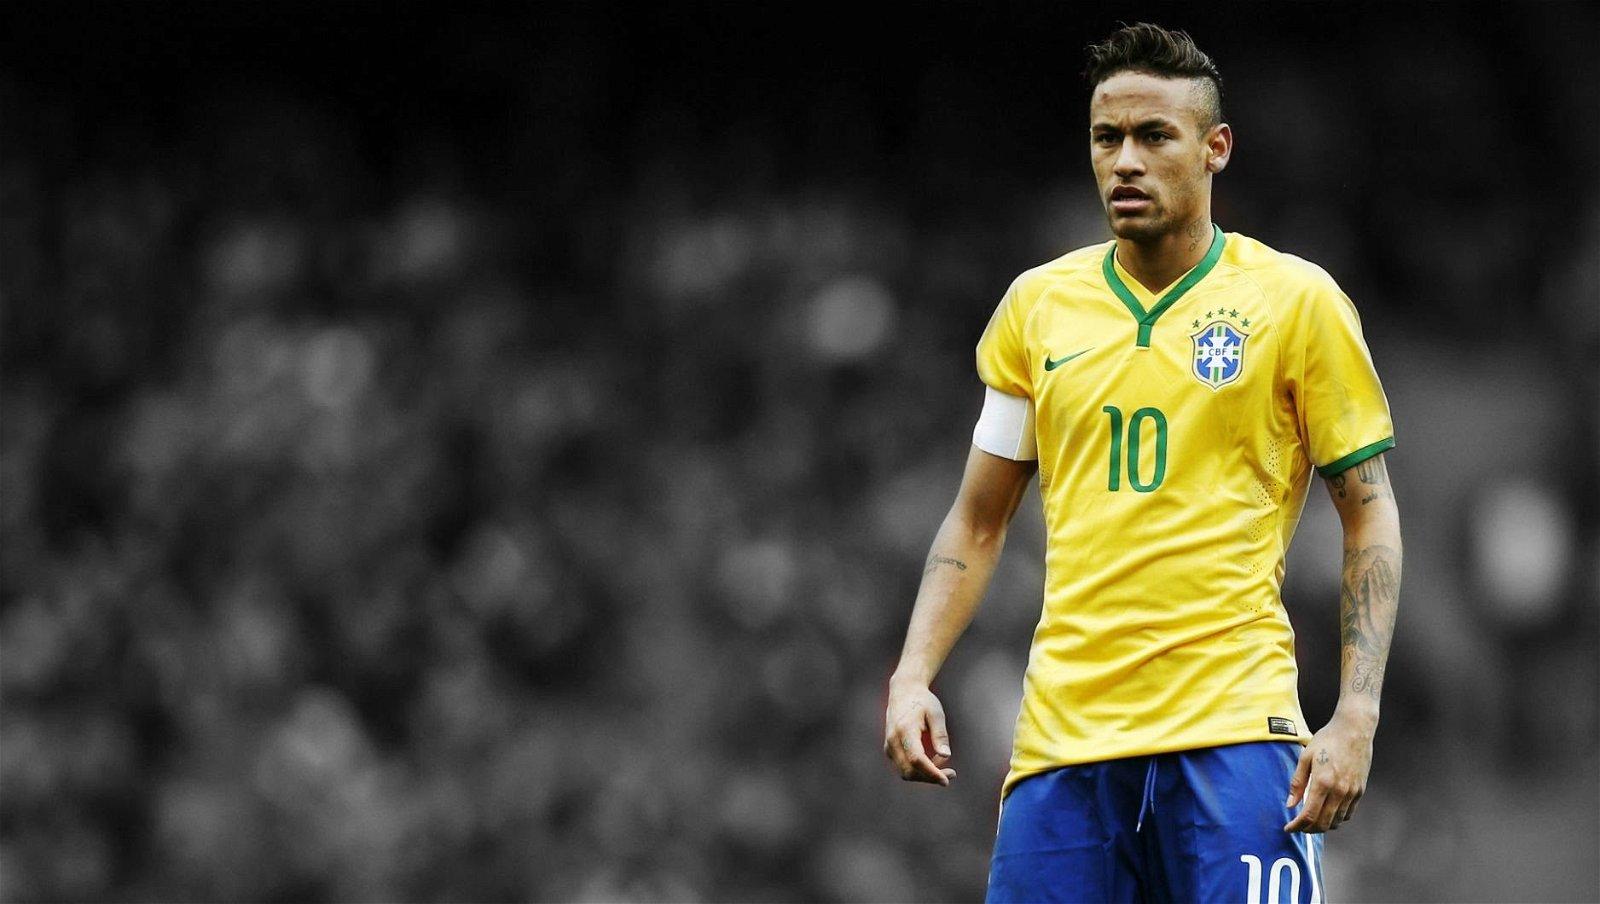 E-Sports: Neymar quiere invertir en un equipo de League of Legends